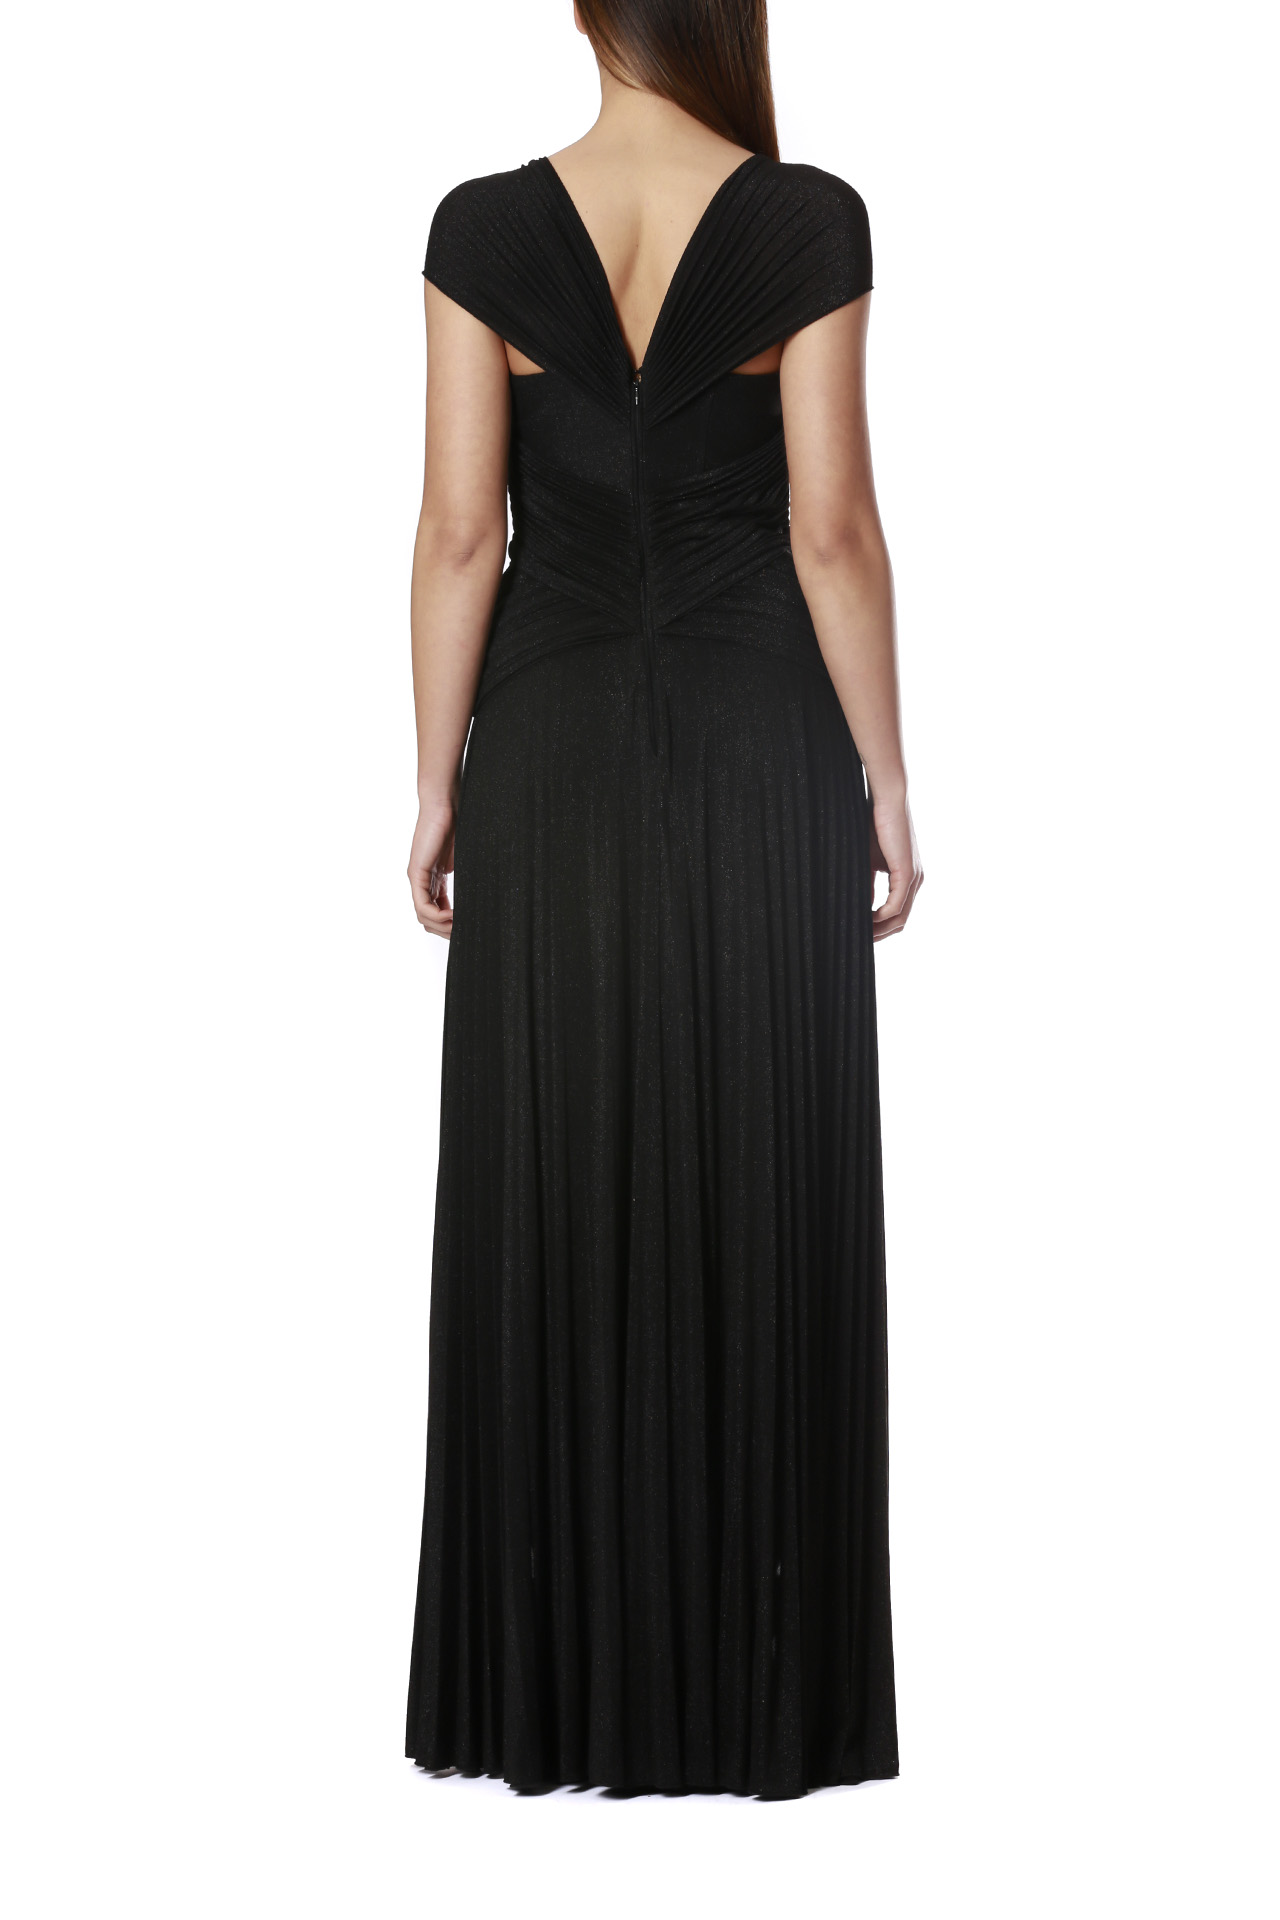 ELISABETTA FRANCHI | Dress | AB17101E2110